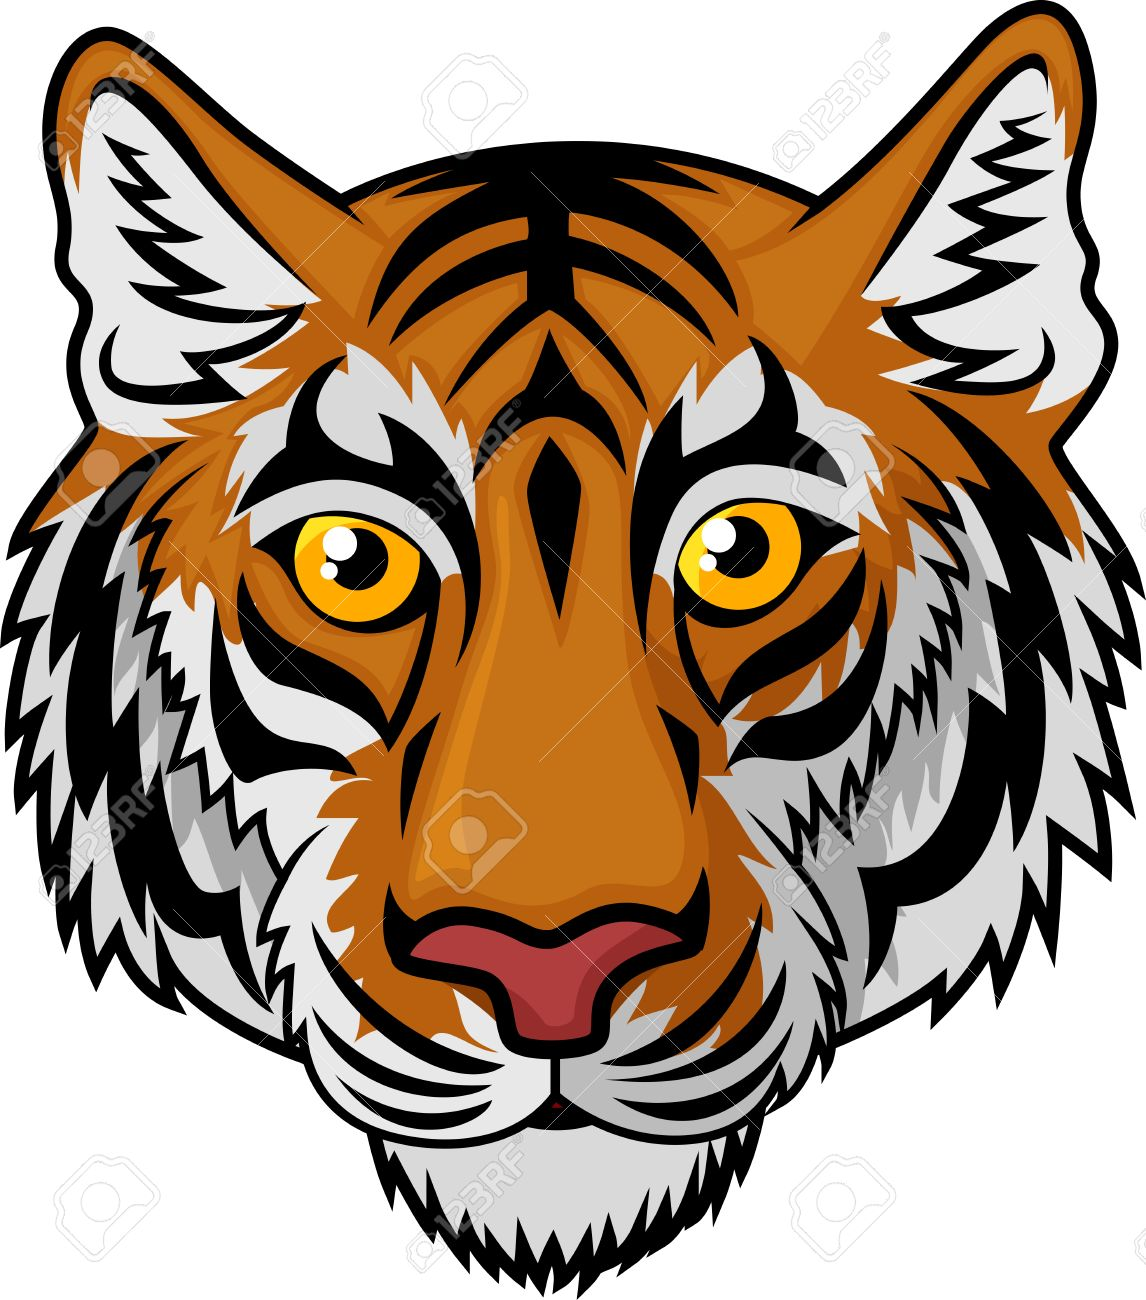 tiger head mascot team sport cartoon royalty free cliparts vectors rh 123rf com cartoon tiger face easy cartoon tiger face pictures